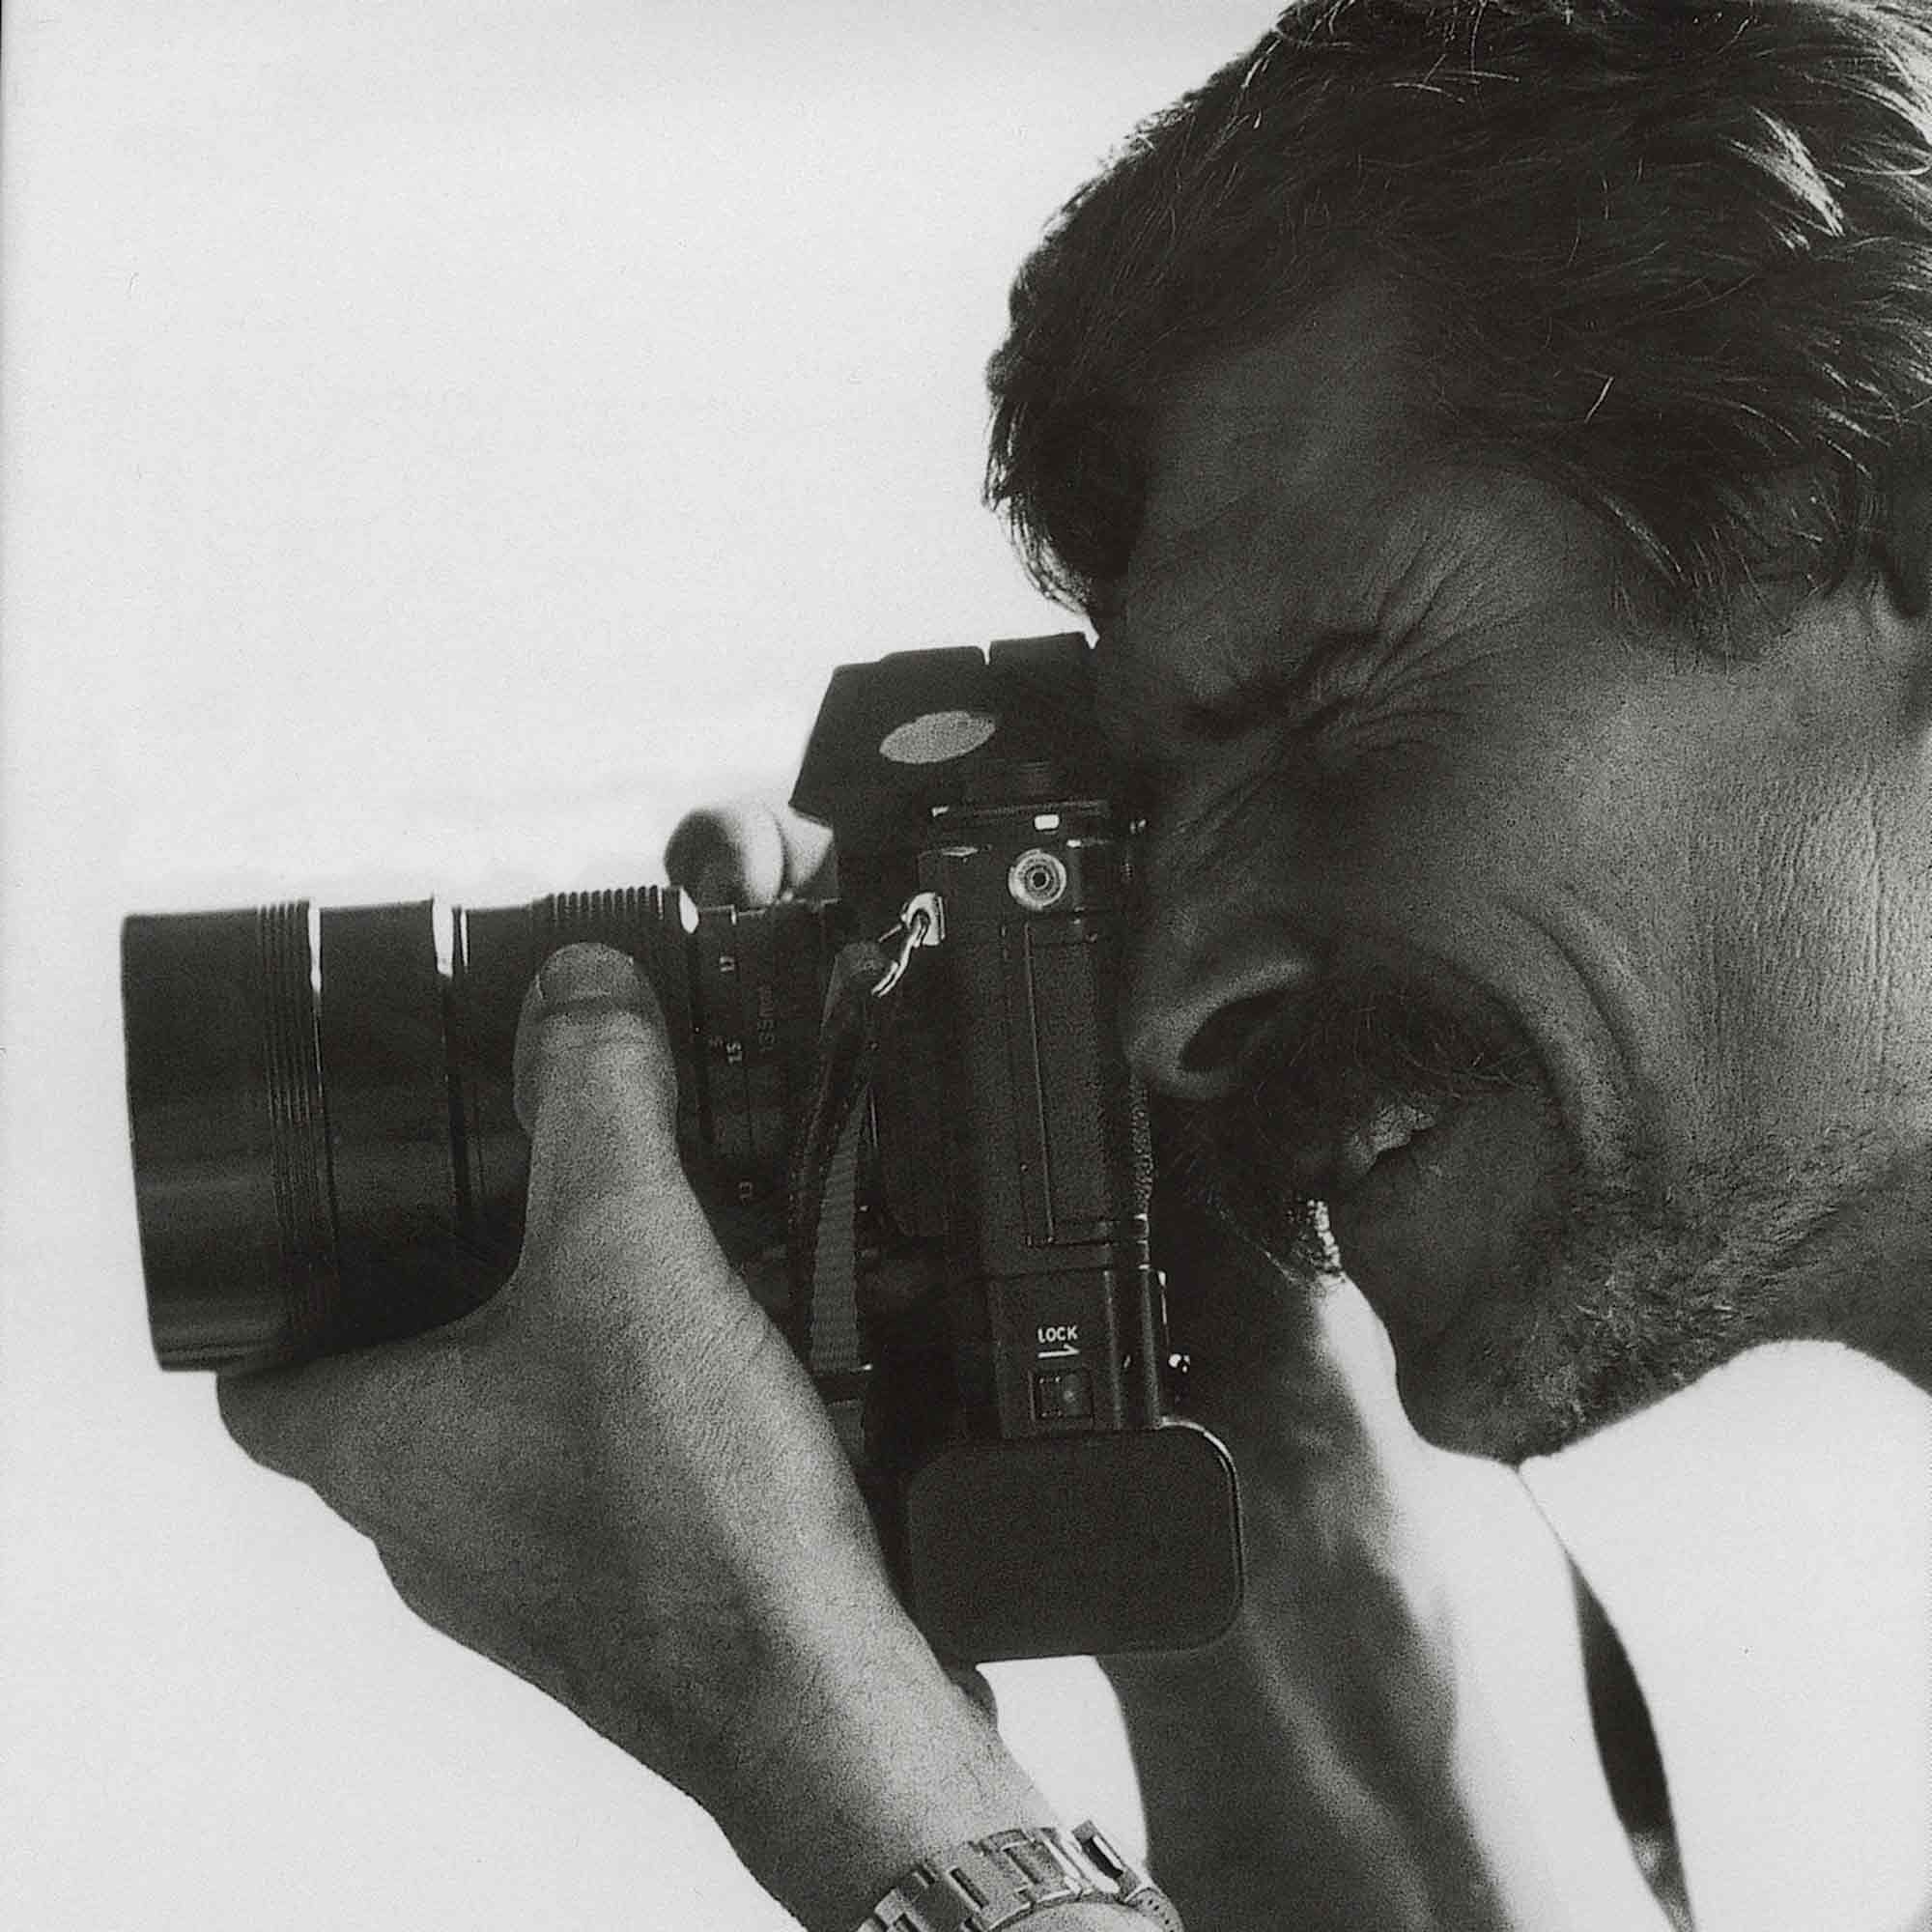 année 90 - Yann-Arthus Bertrand - photo de Philippe Bourseillier